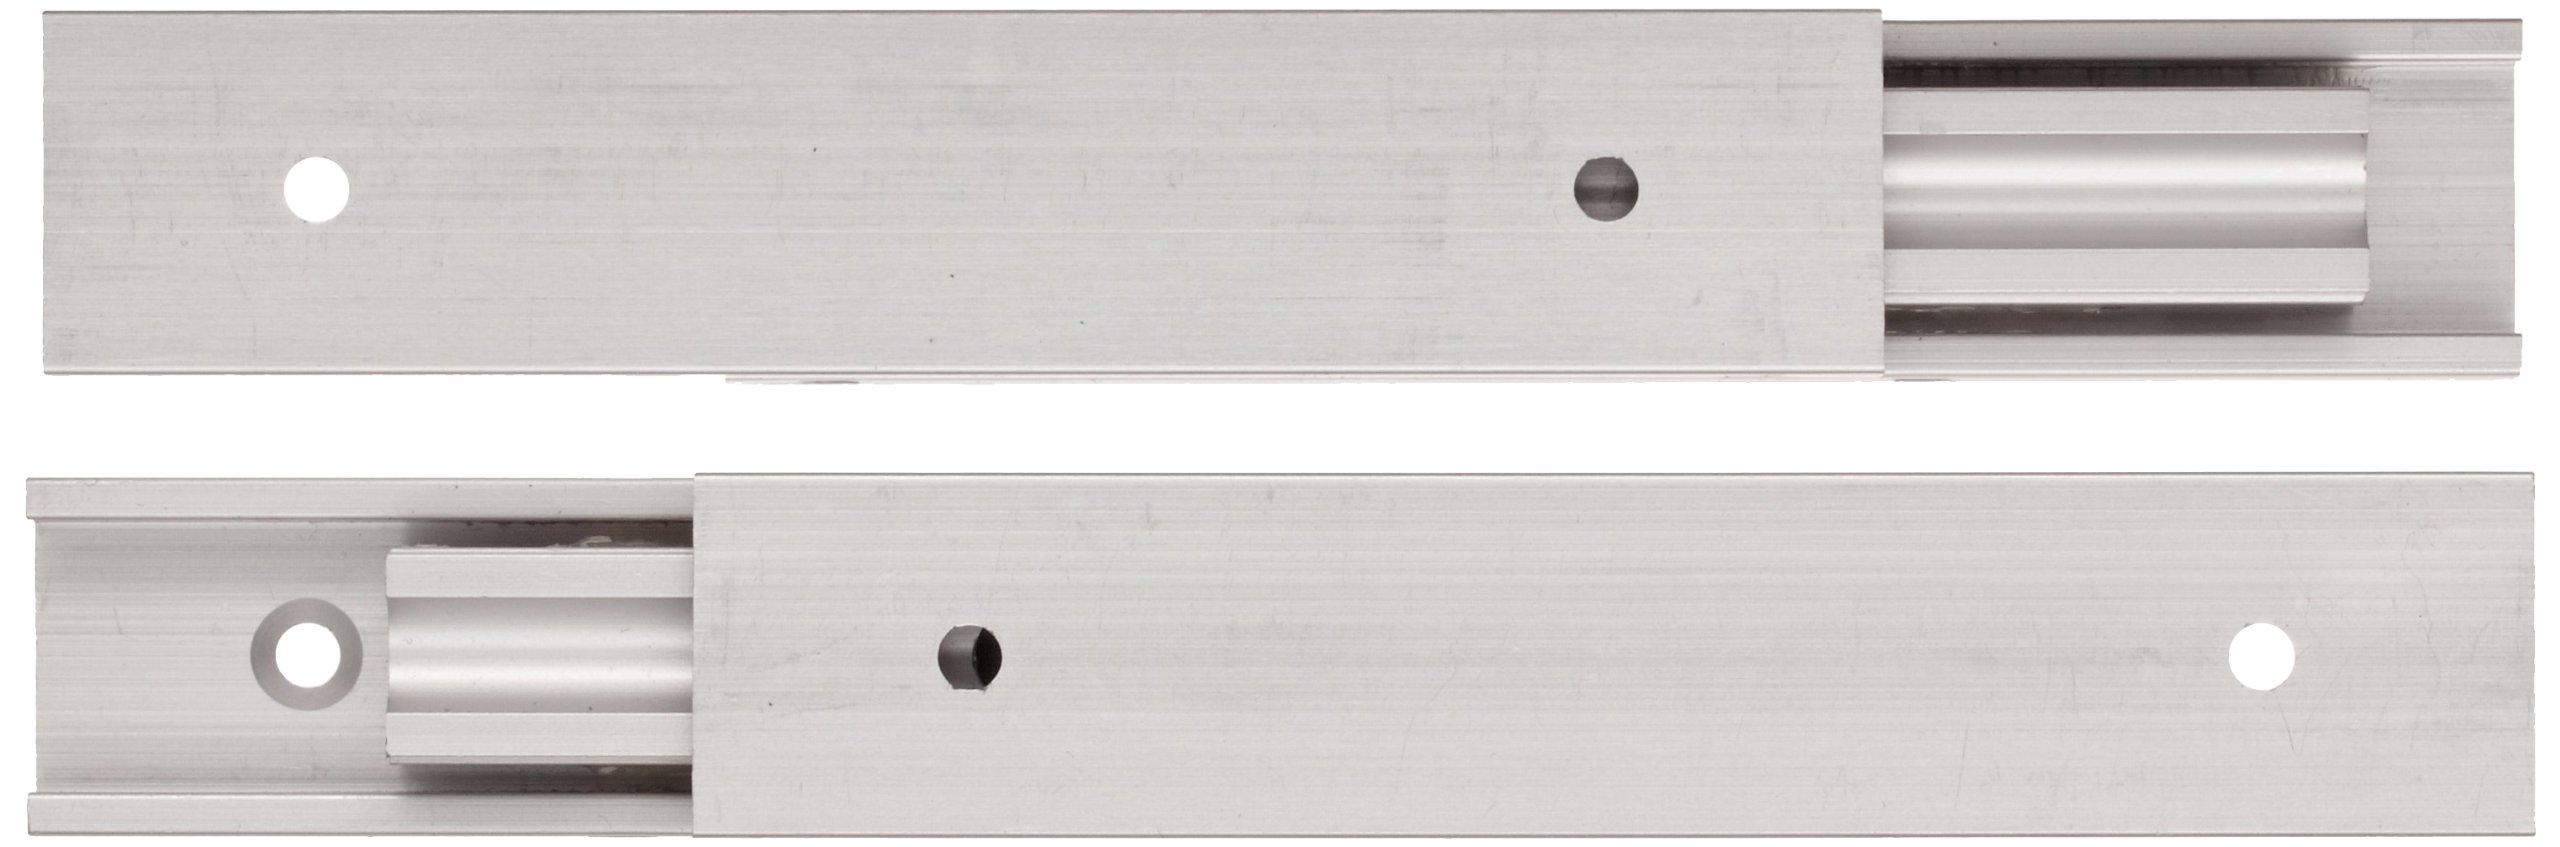 Sugastune AR3 Aluminum Drawer Slide, Full Extension, Positive Stop, 7-7/8'' Closed, 8-25/32'' Travel, 32 lbs/Pack Ld Cap (1 Pair)